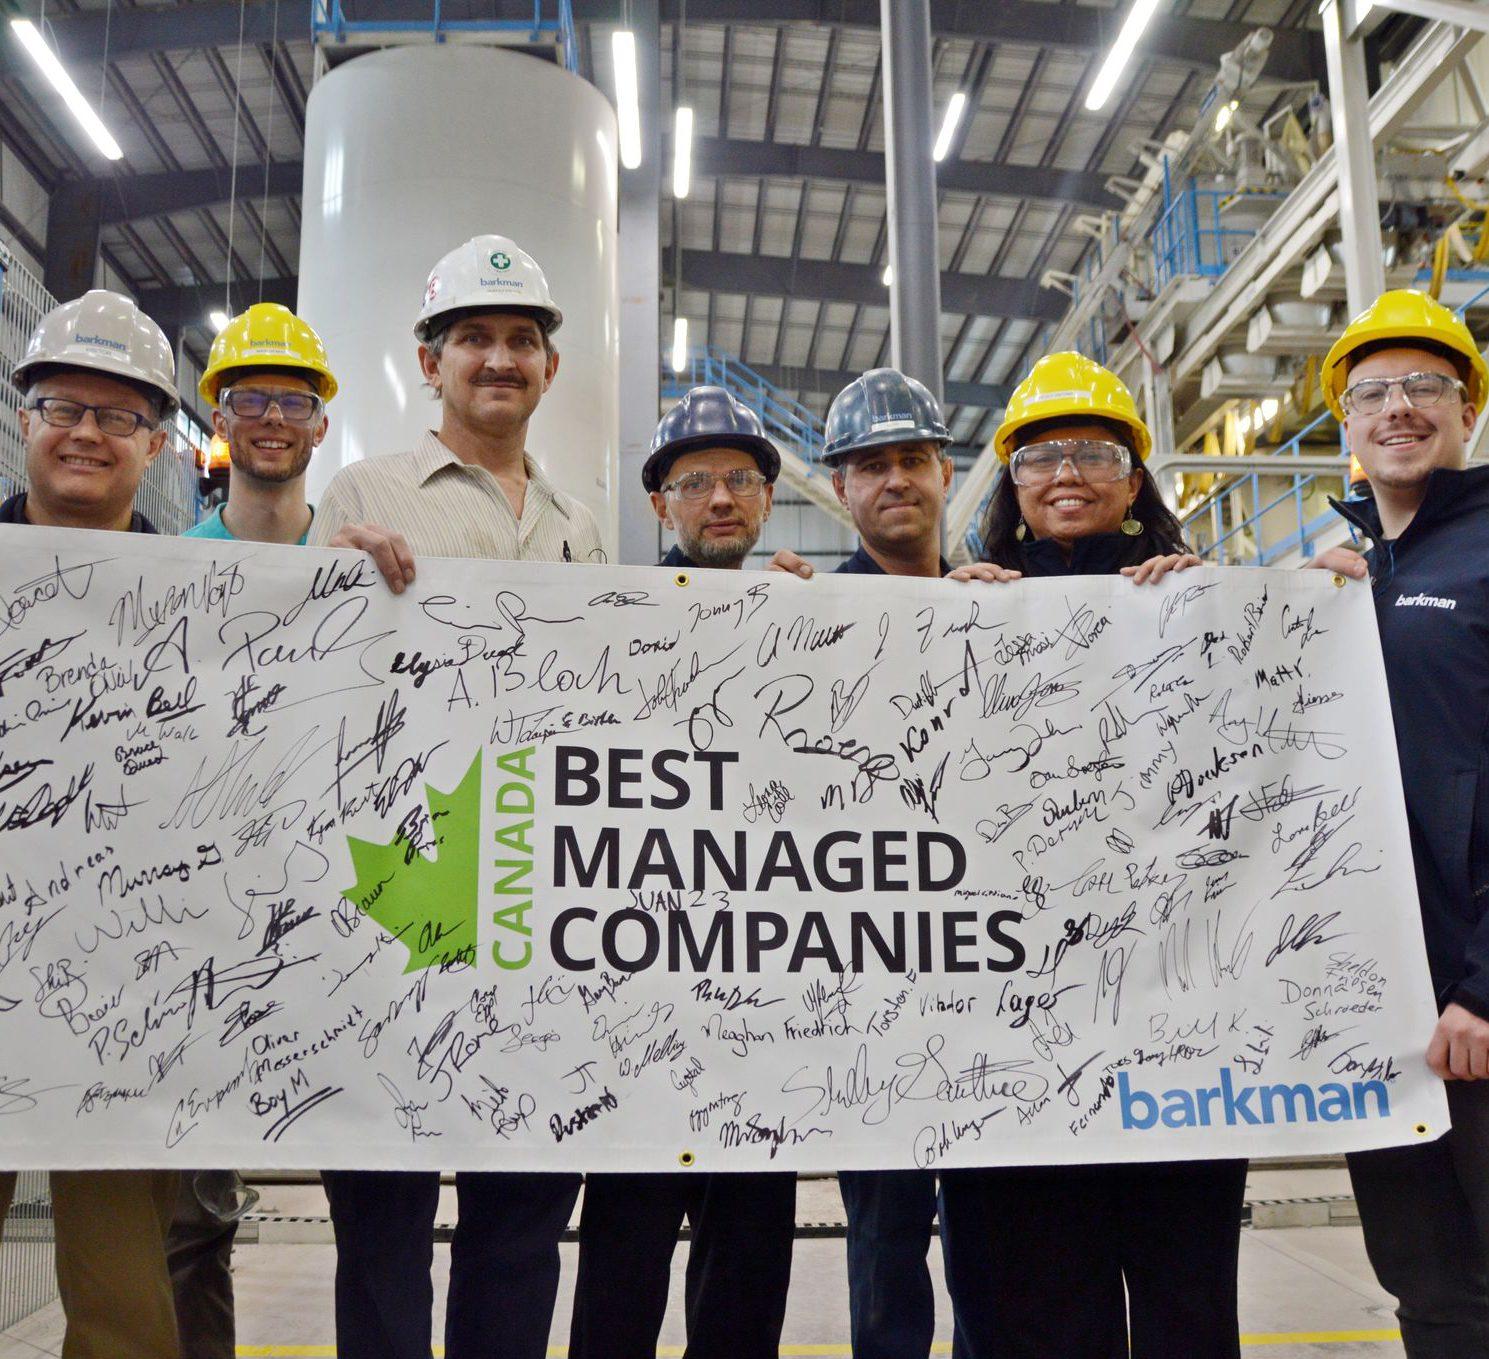 Barkman staff and banner